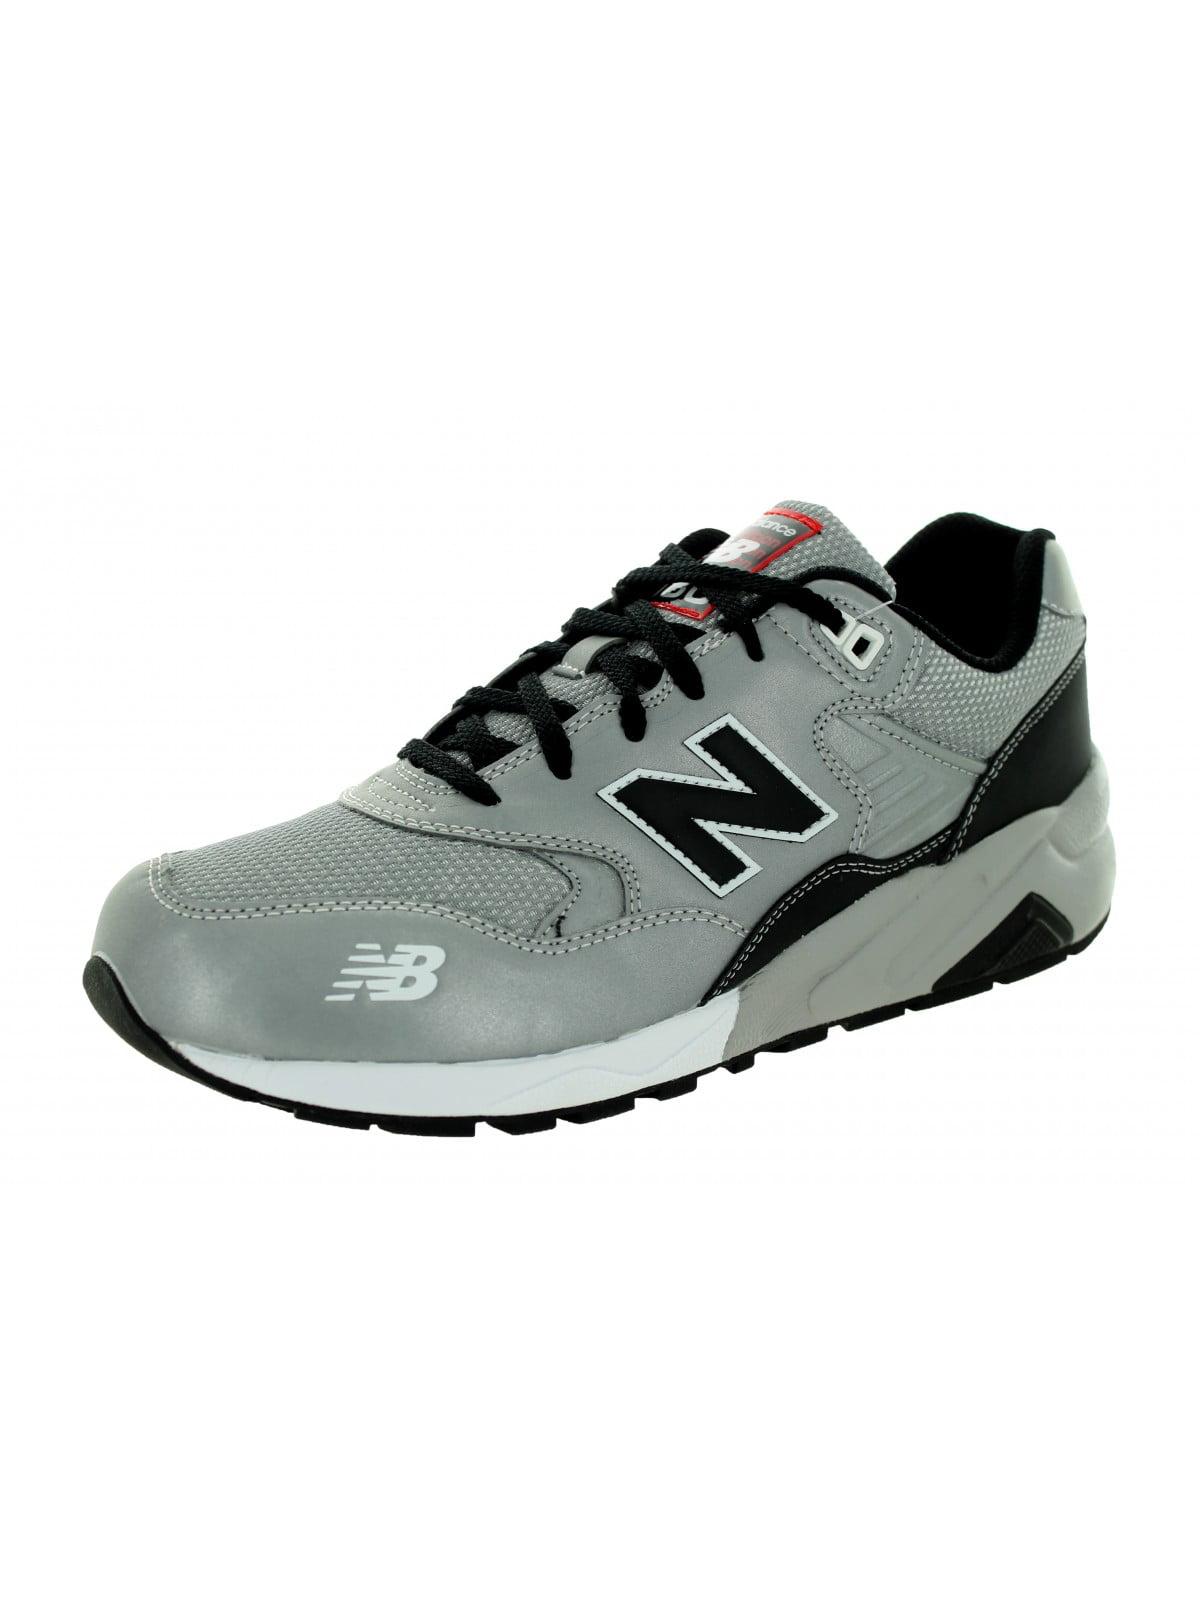 New Balance Men's 580 Lifestyle Running Shoe by New Balance